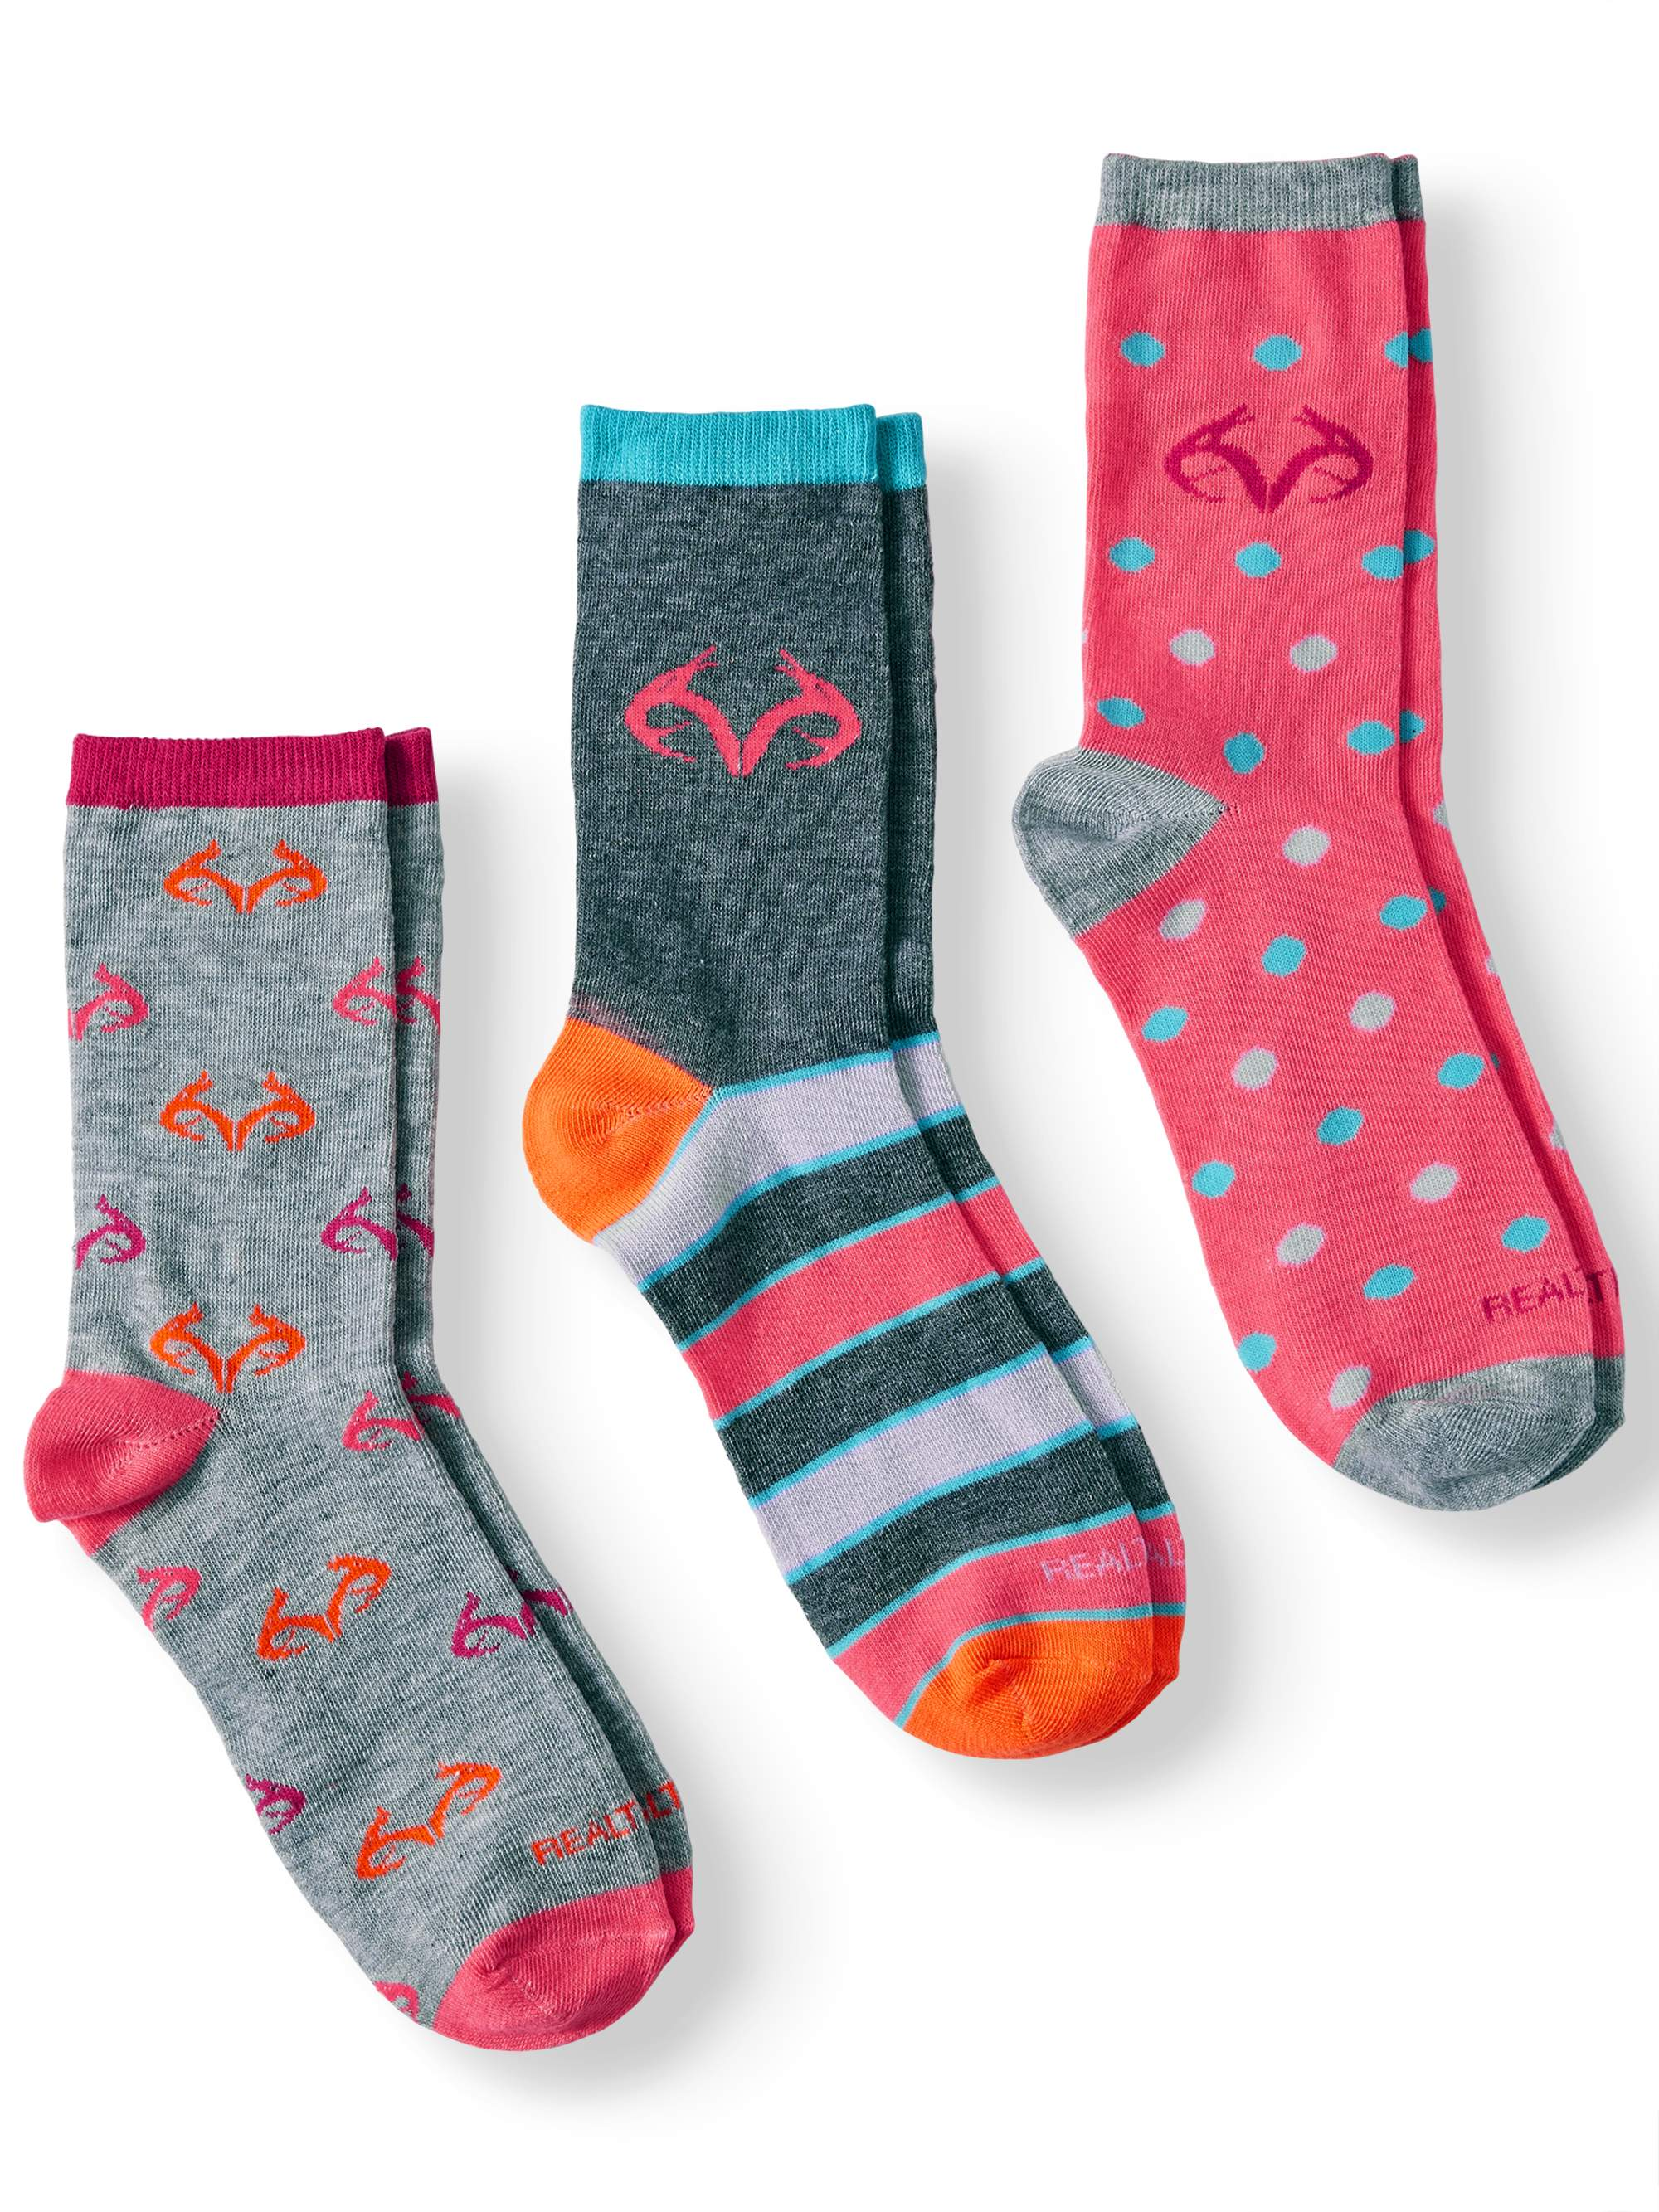 Realtree Novelty Crew Socks, 3 Pairs (Little Girls & Big Girls)